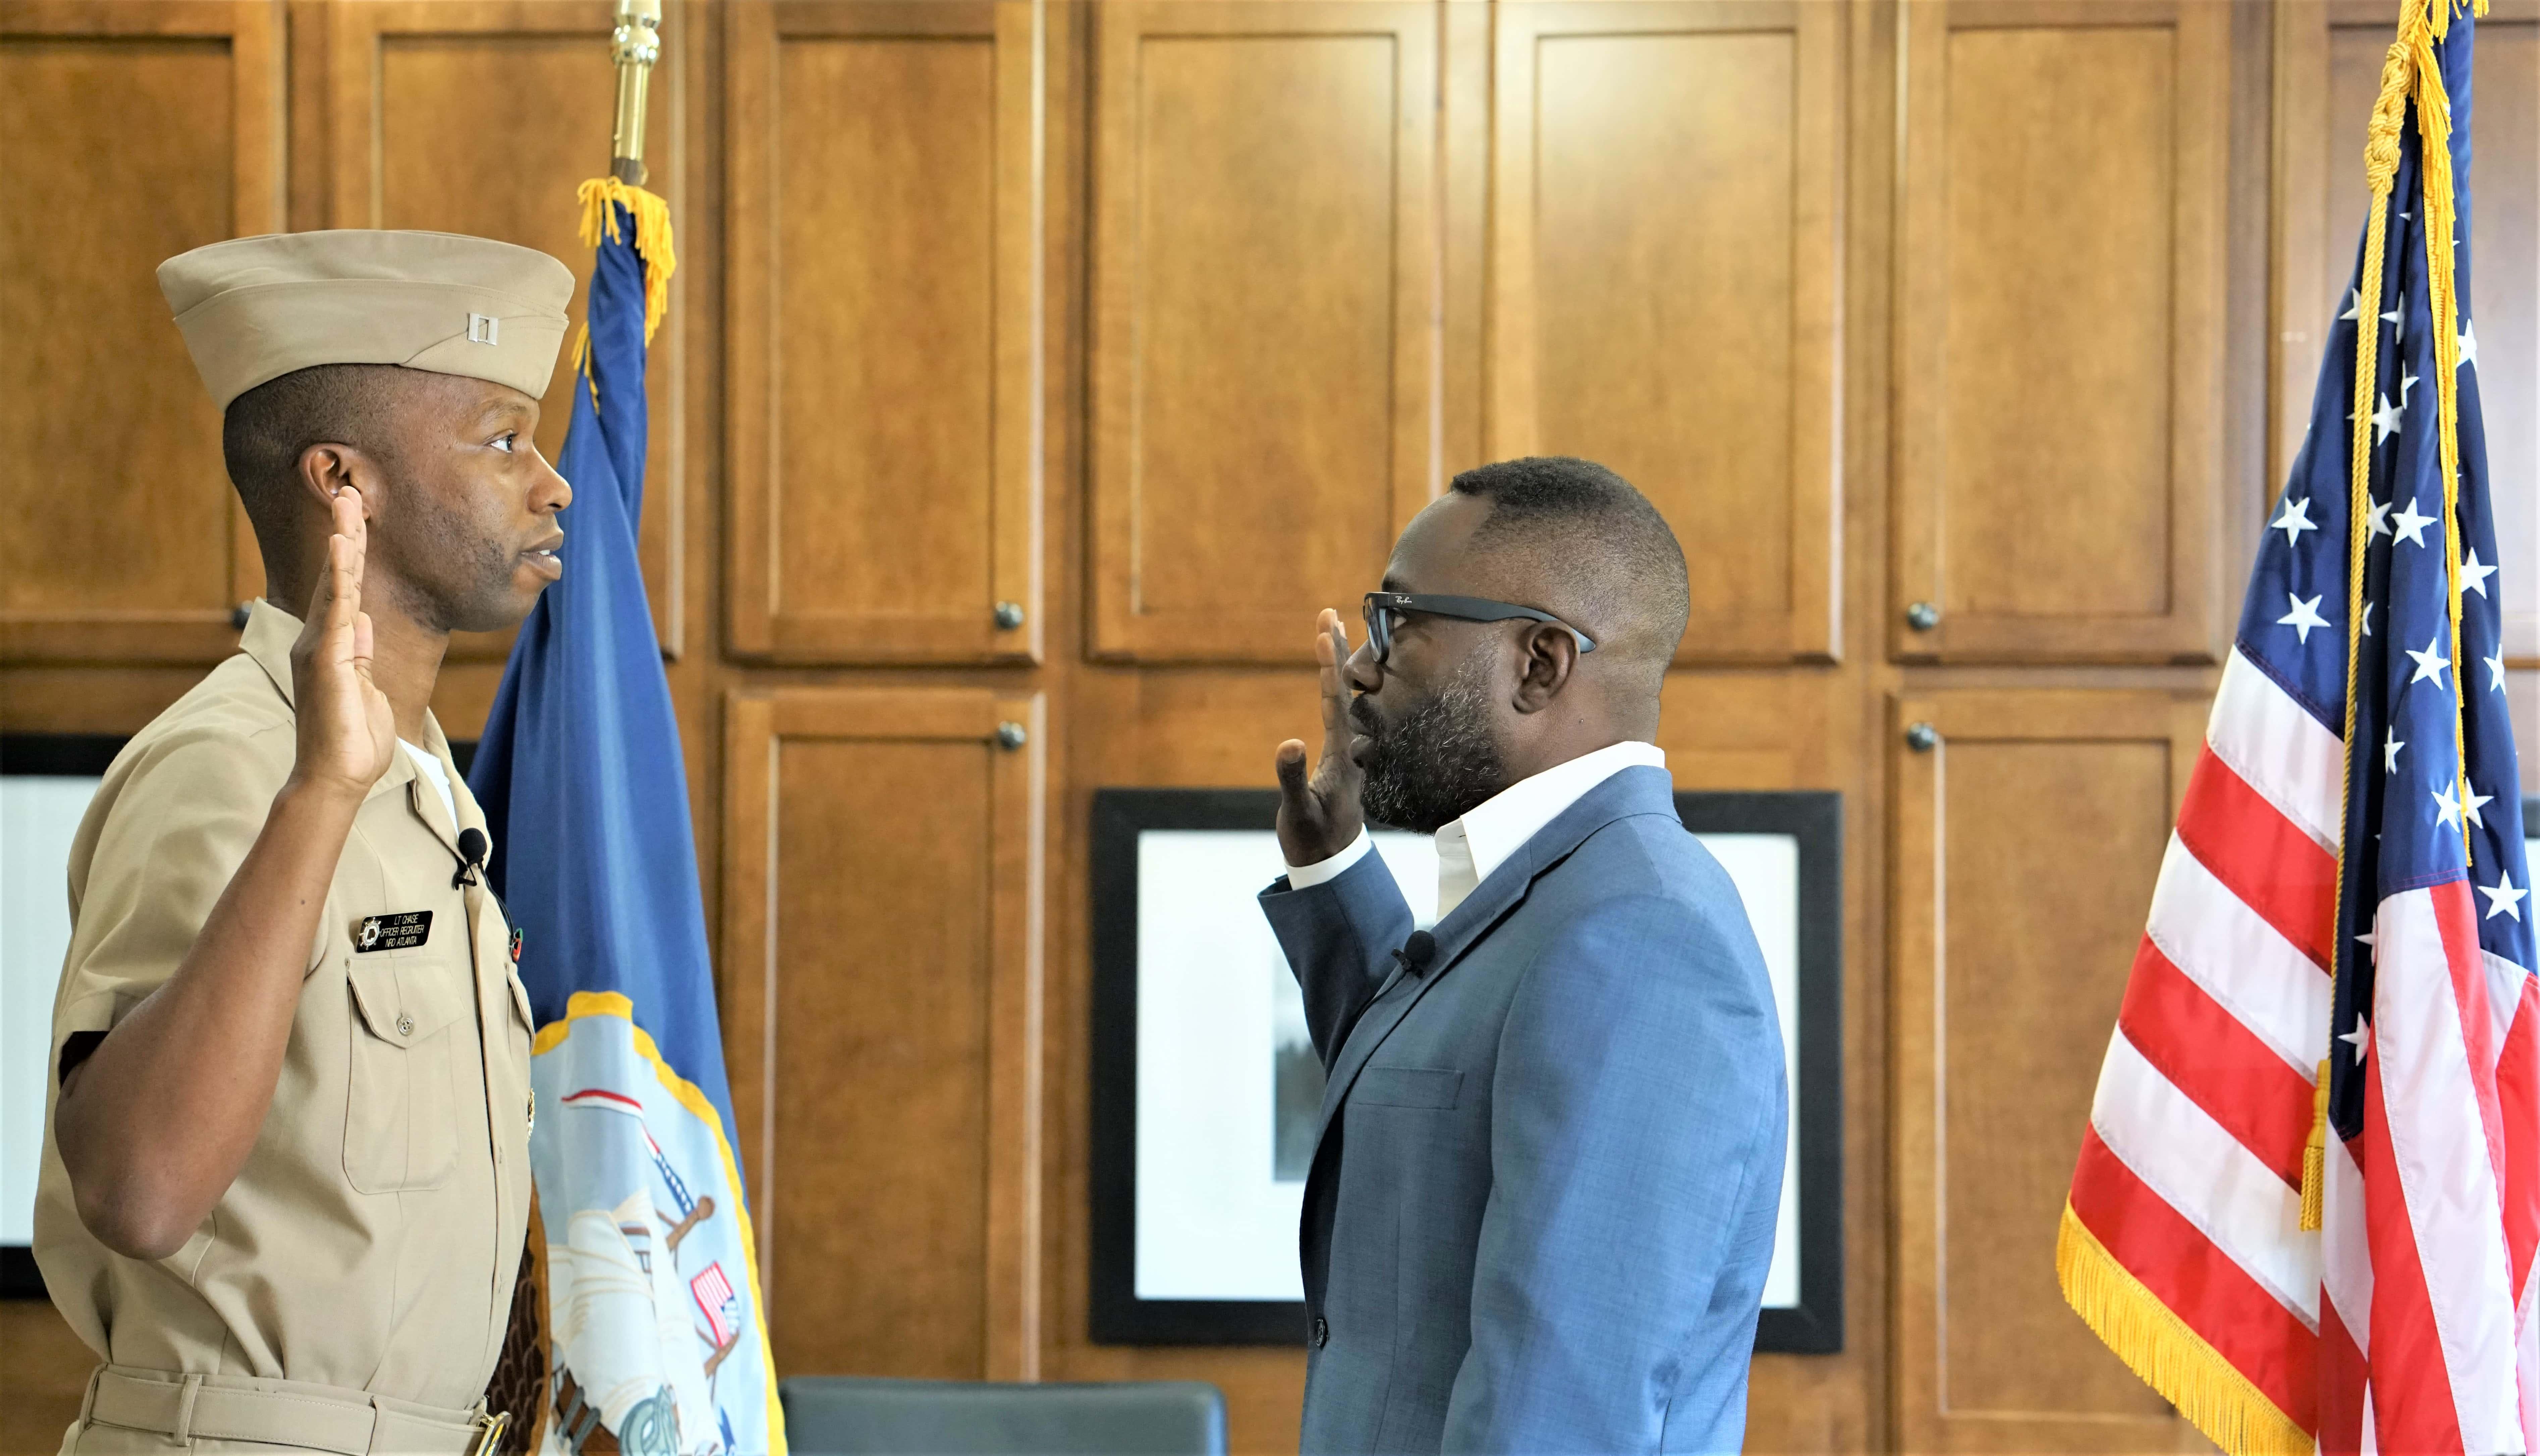 Nation's Top-leading Surgeon, Dr.Chris Ibikunle Joins United States Navy As Lieutenant Commander